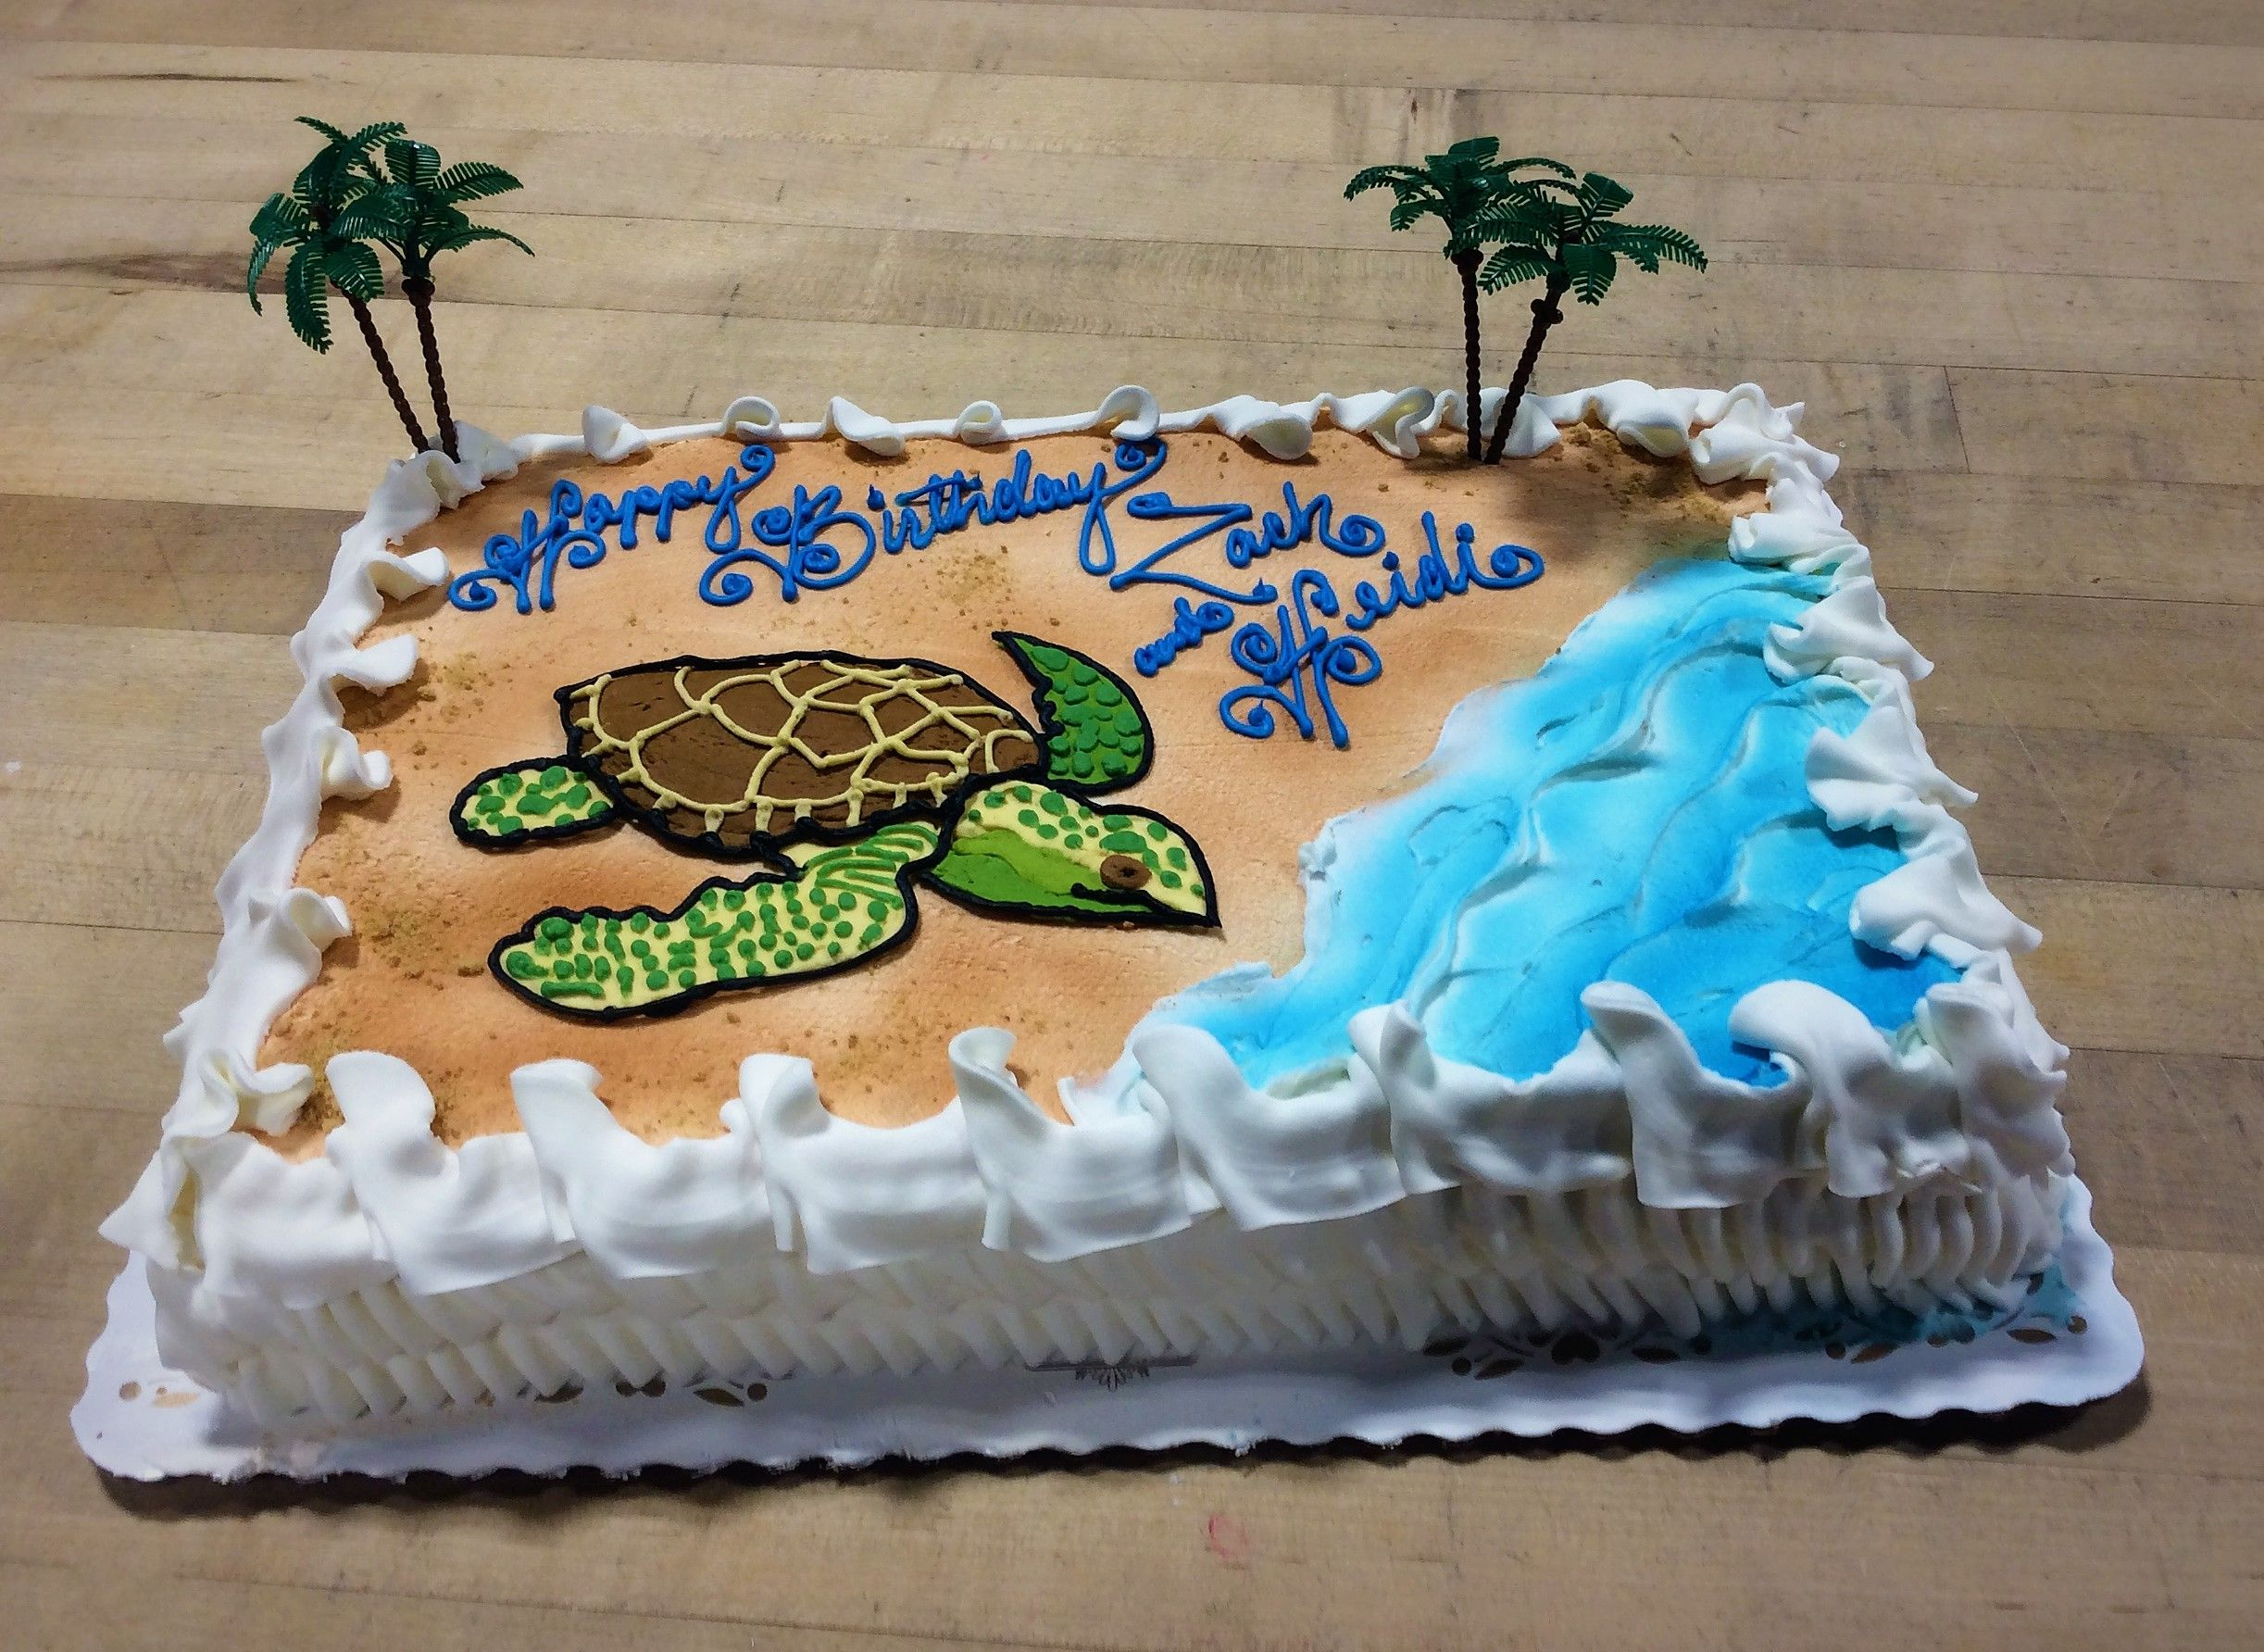 Terrific Sheet Cake With Sea Turtle And Beach Scene Birthday Sheet Cakes Funny Birthday Cards Online Inifofree Goldxyz